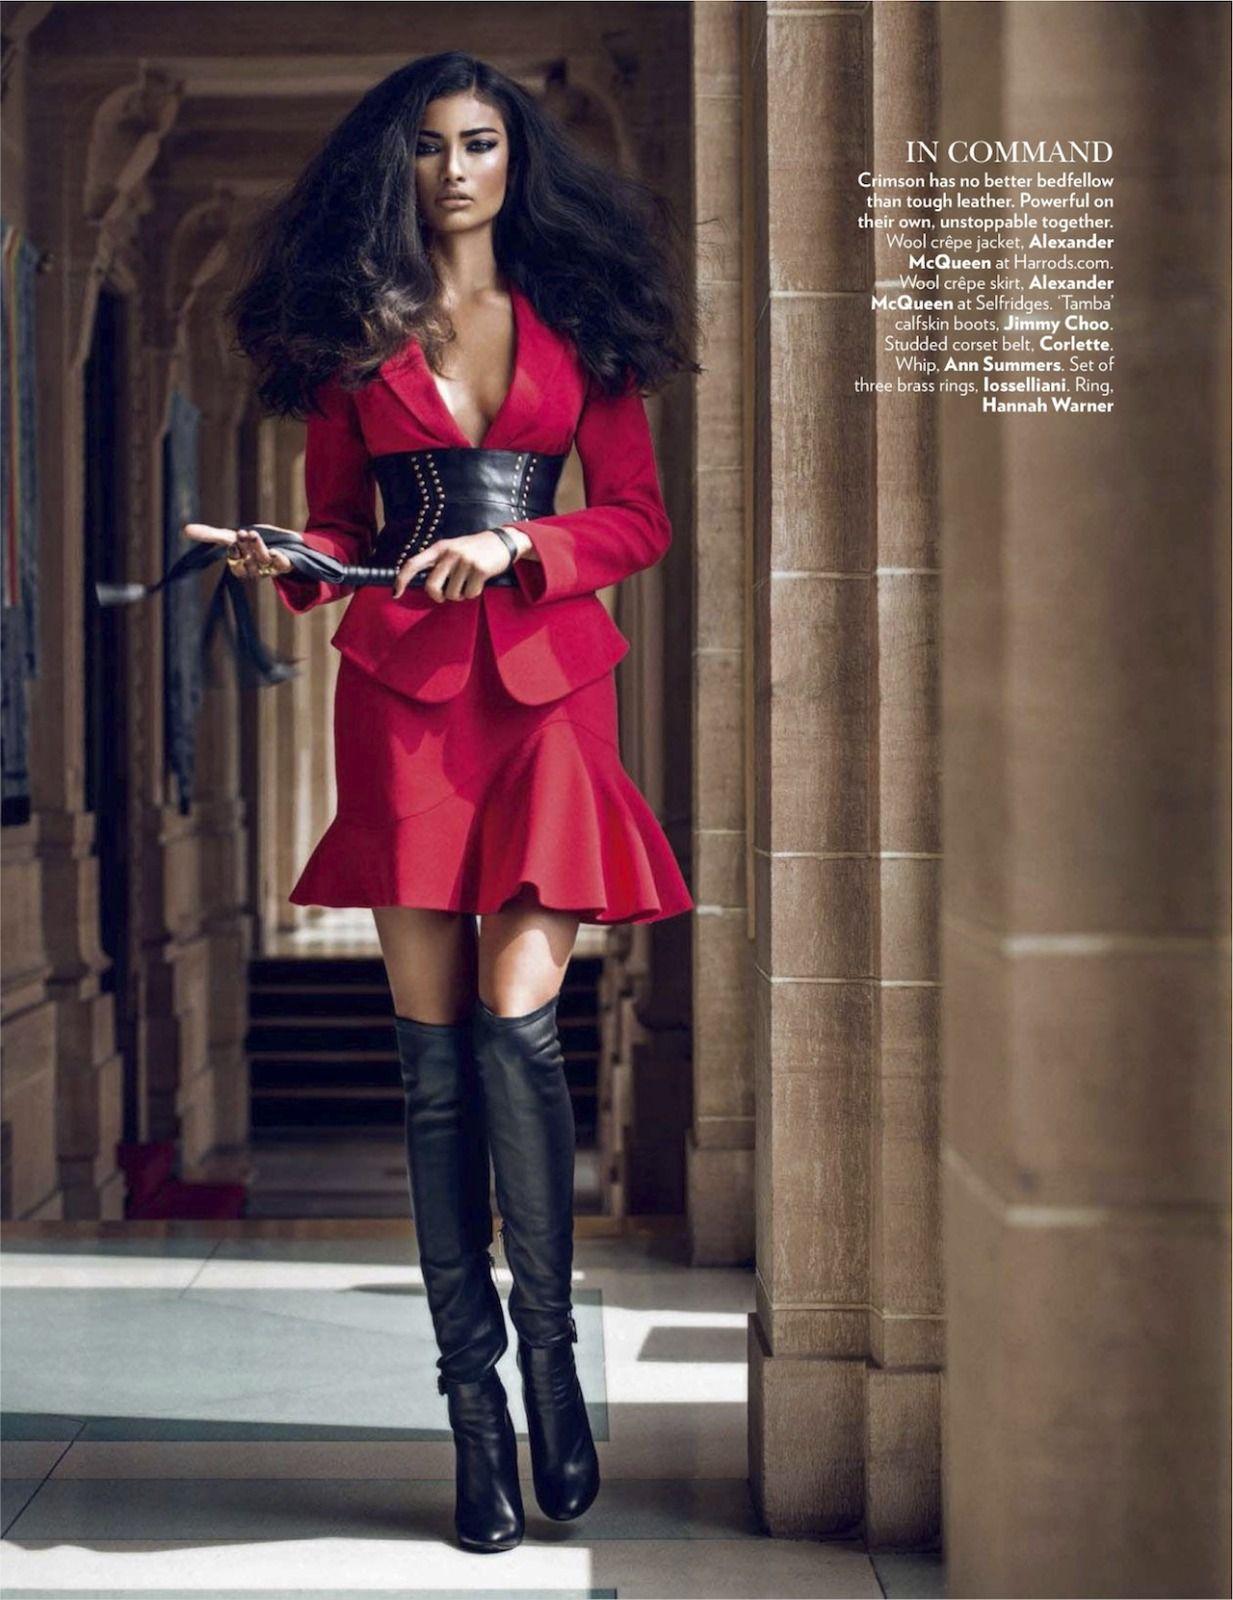 sexy red dress with big black belt over knee boots fashion pinterest vogue india. Black Bedroom Furniture Sets. Home Design Ideas